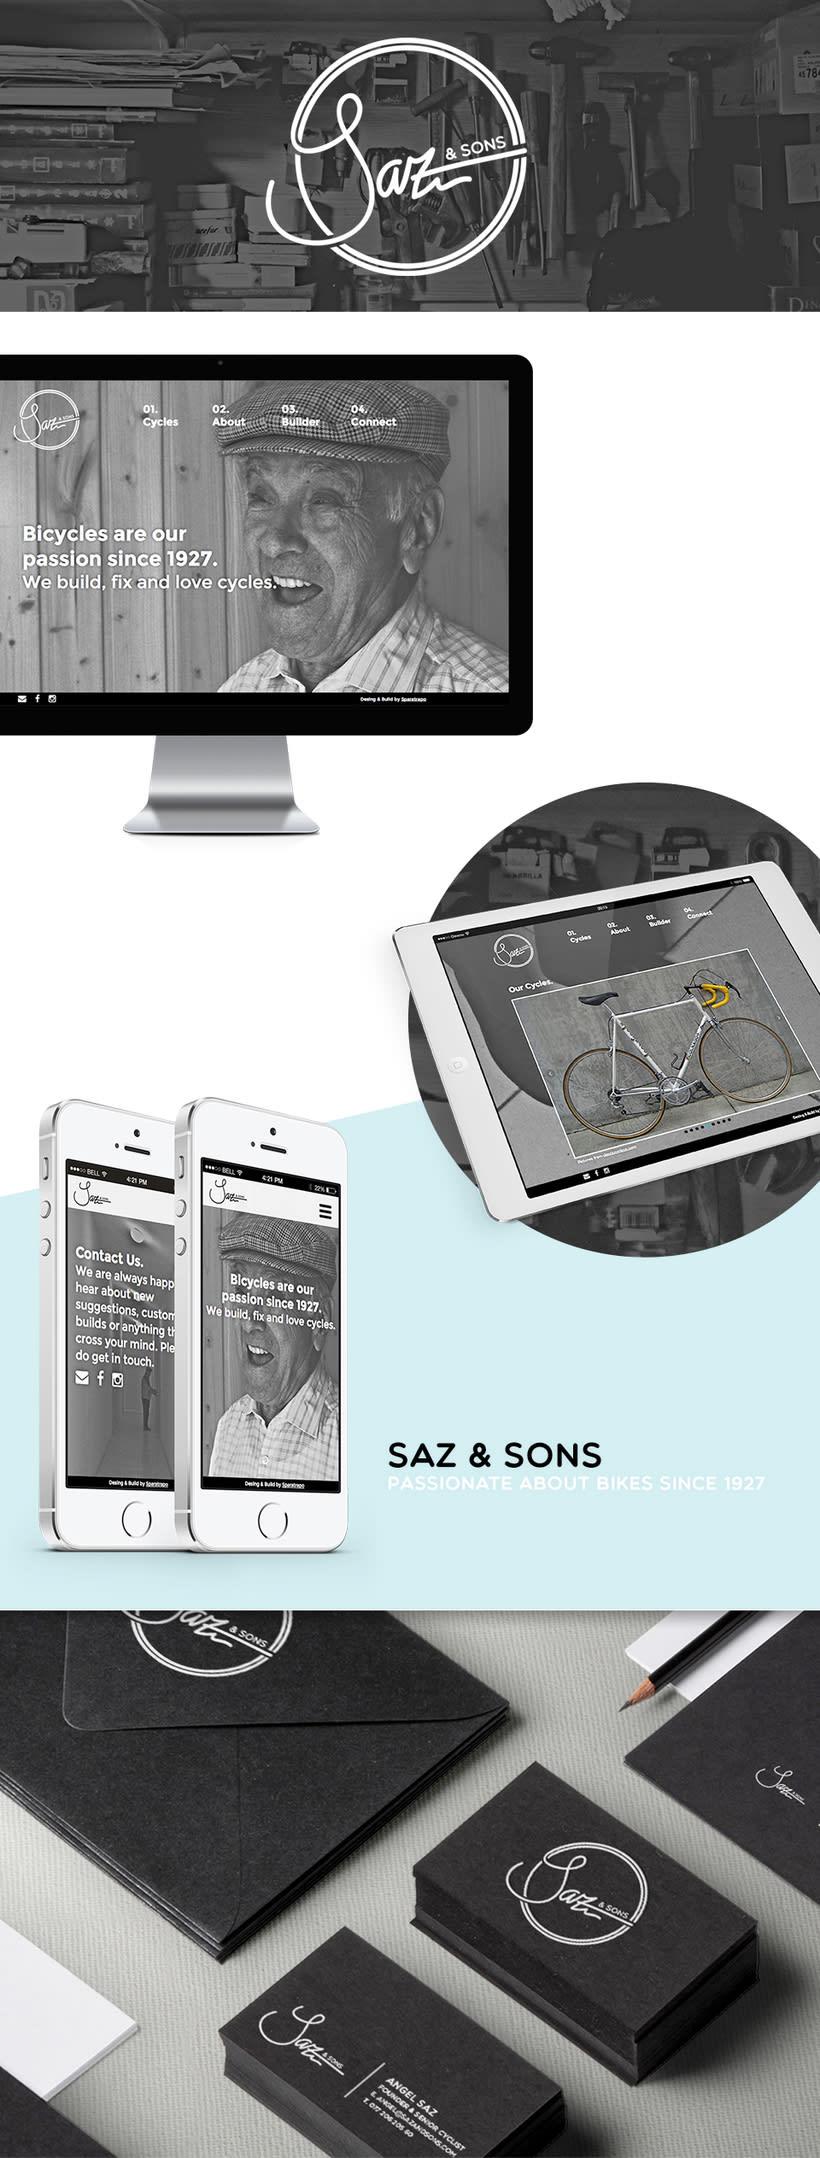 Saz & Sons - WIP -1